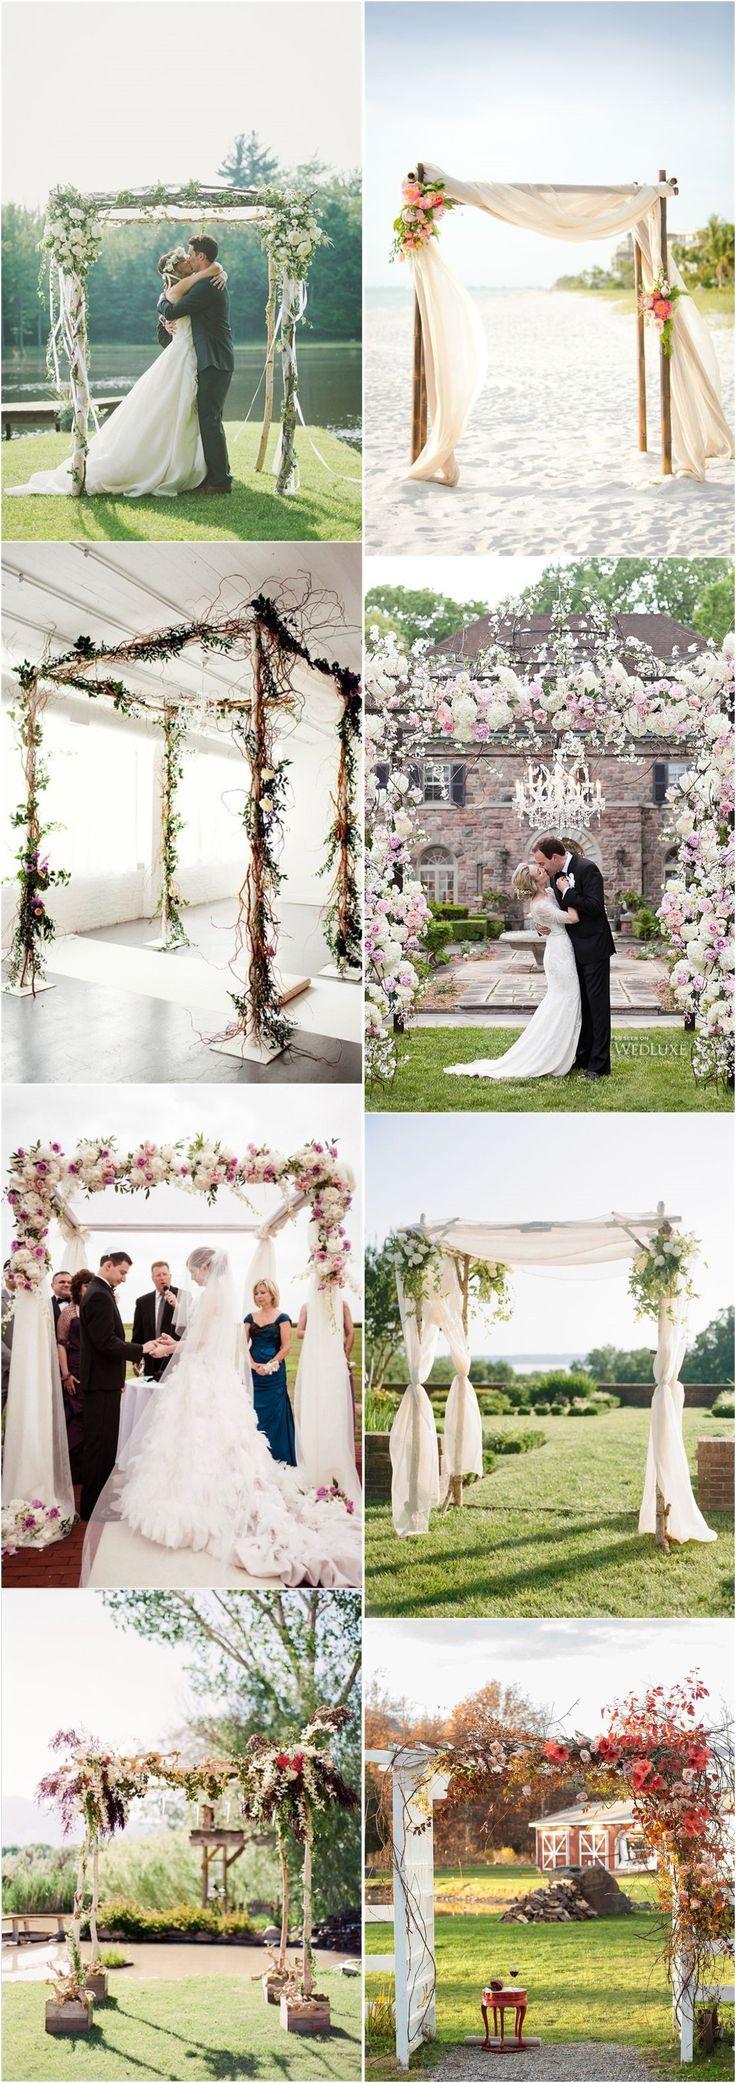 Best 25 altar decorations ideas on pinterest wedding for Altar decoration ideas